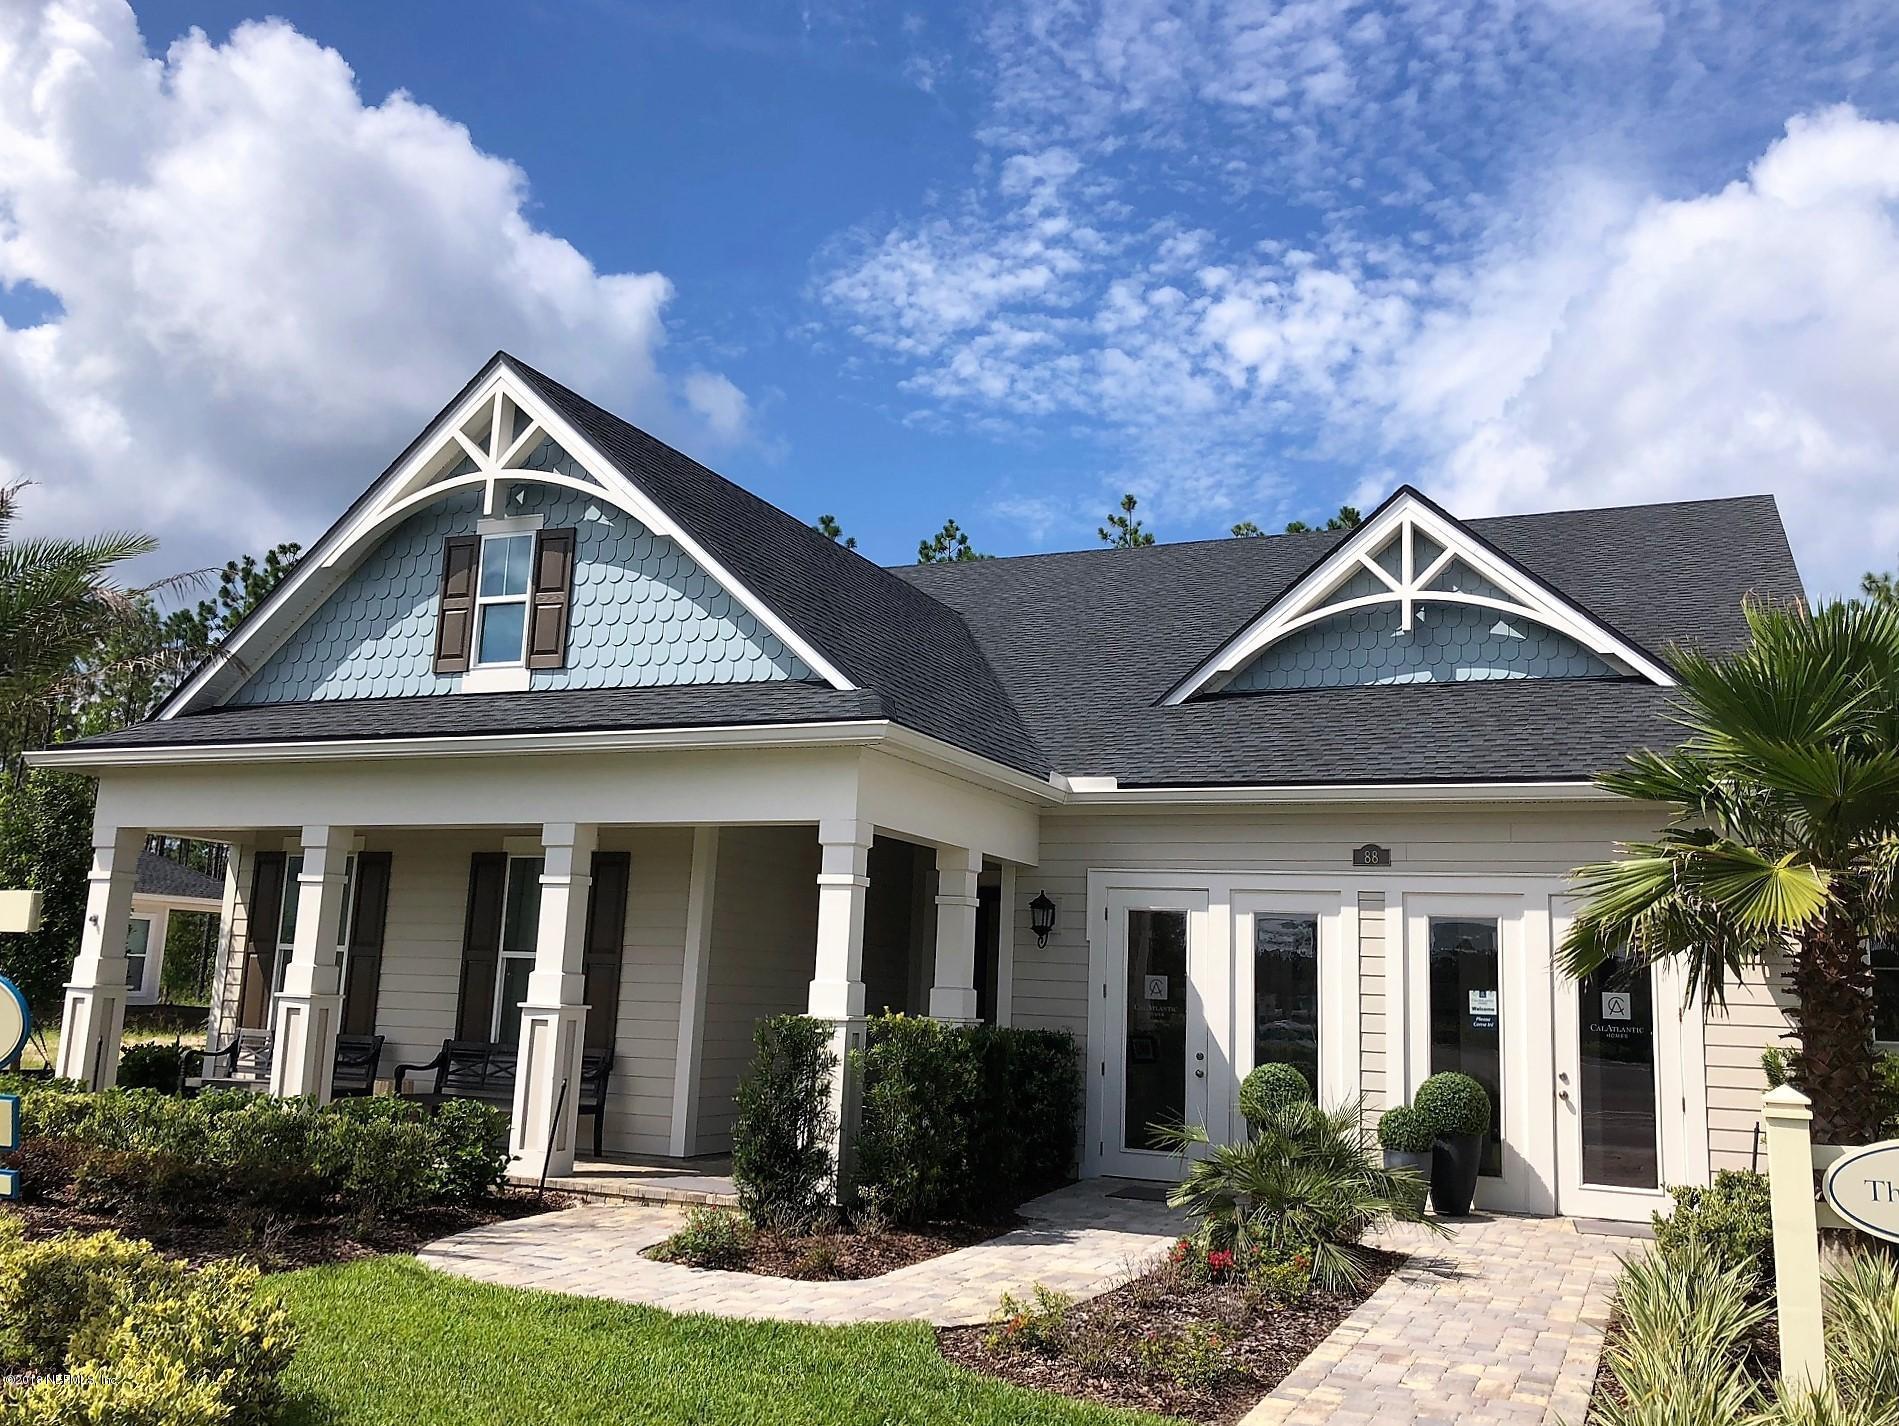 88 VILLAGE GRANDE, PONTE VEDRA, FLORIDA 32081, 3 Bedrooms Bedrooms, ,4 BathroomsBathrooms,Residential - single family,For sale,VILLAGE GRANDE,946618